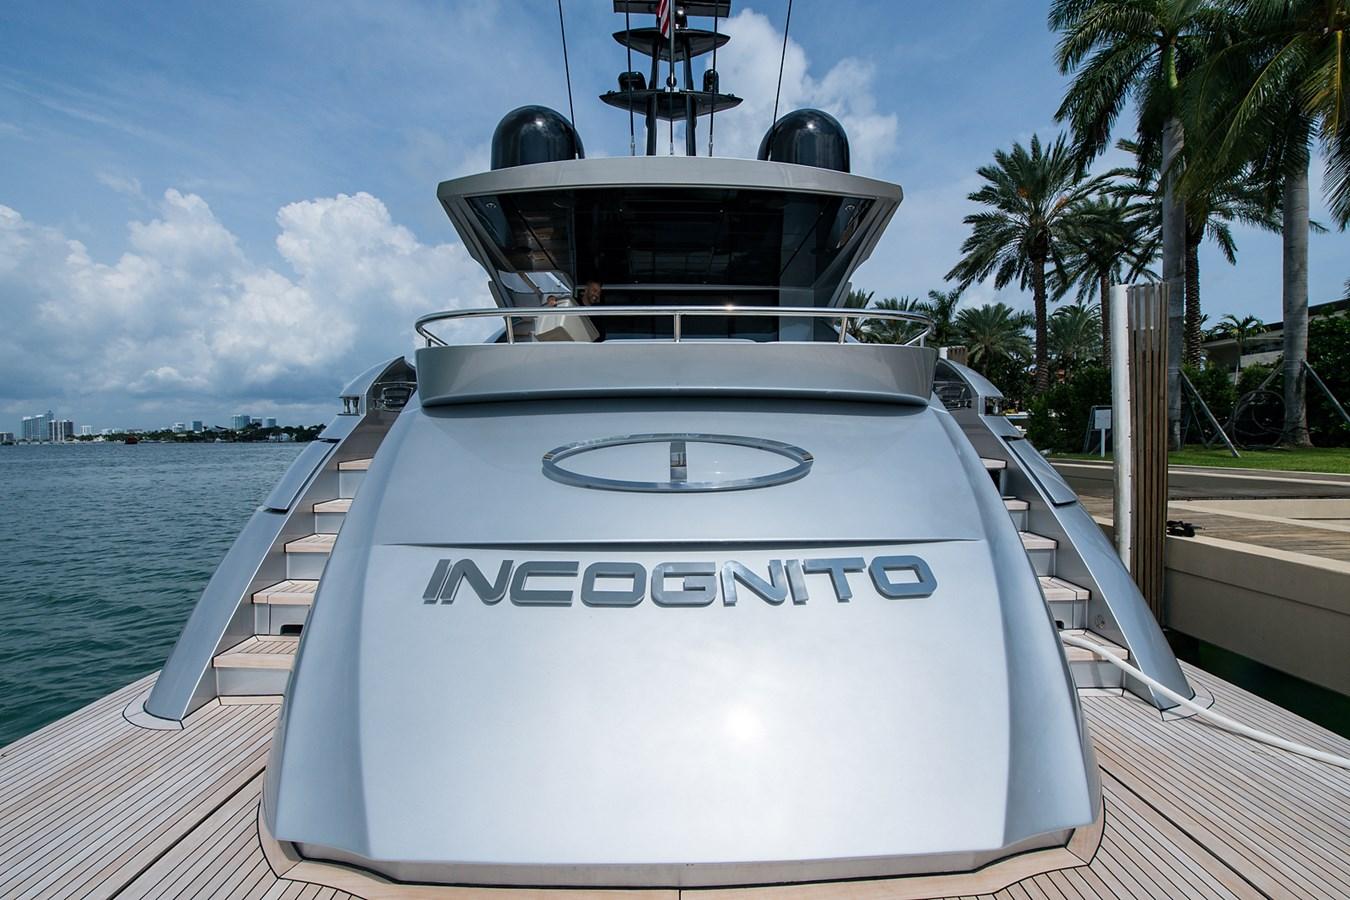 Incognito_Swim Platform2 2012 PERSHING  Motor Yacht 2810543